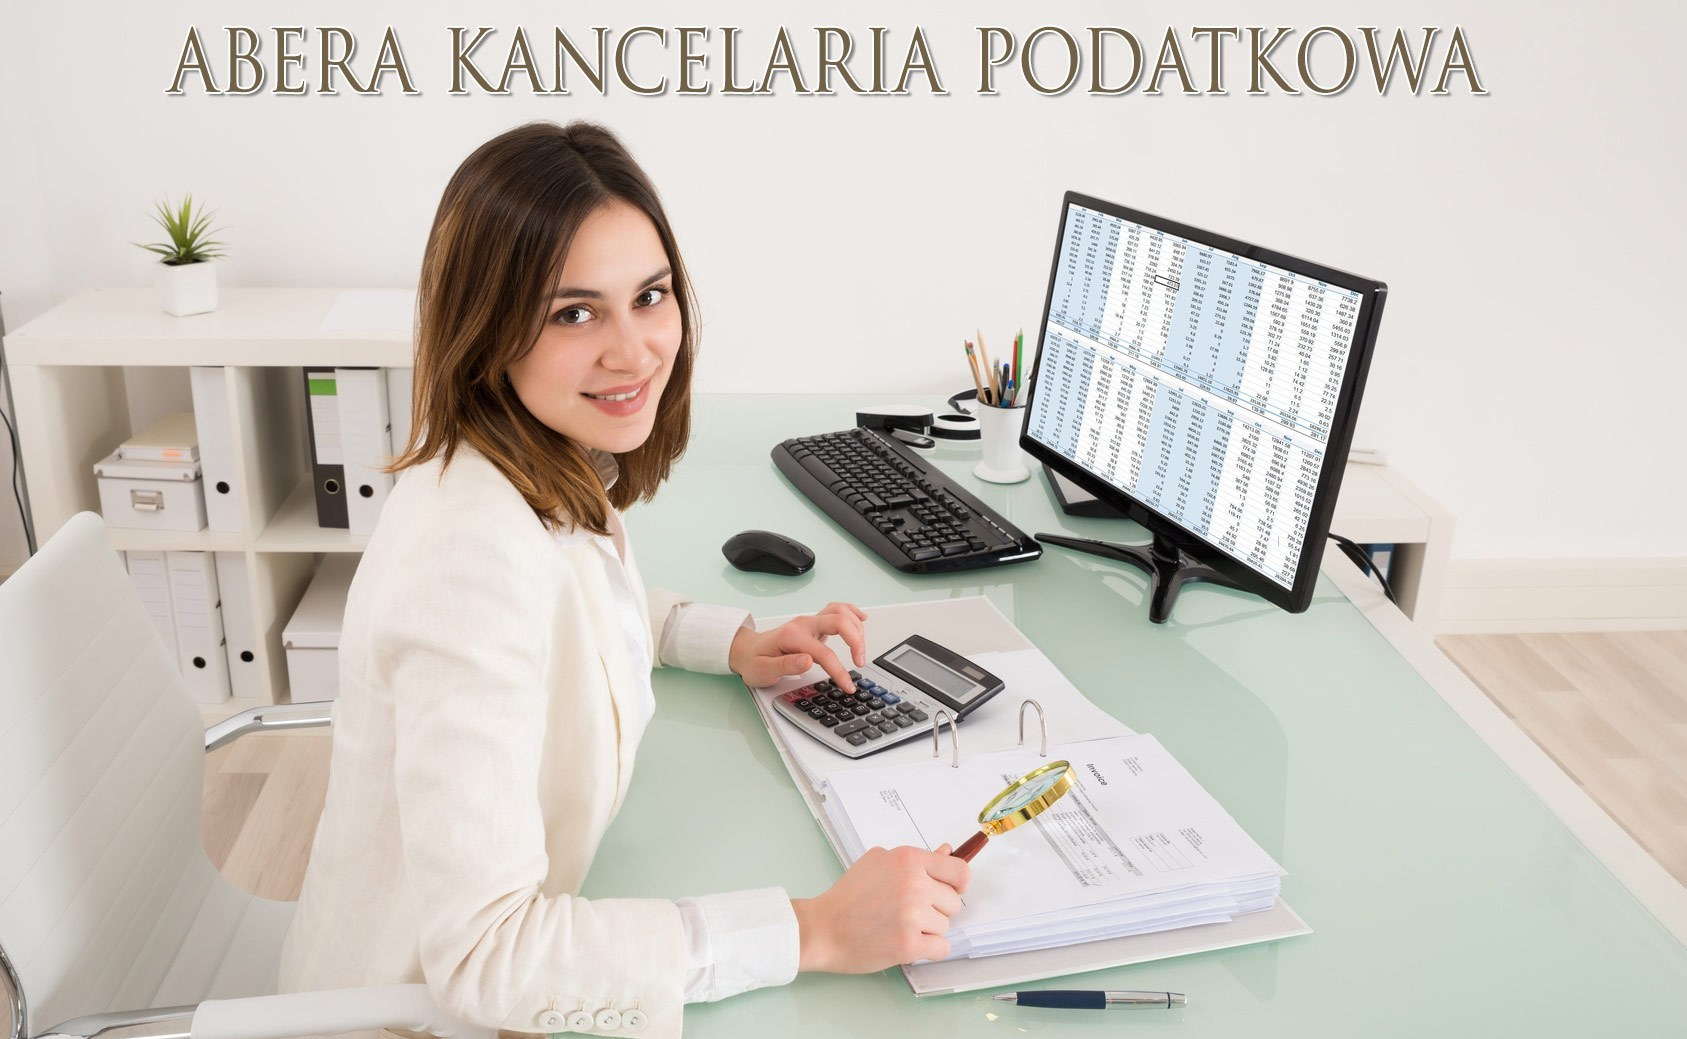 Abera Kancelaria Podatkowa